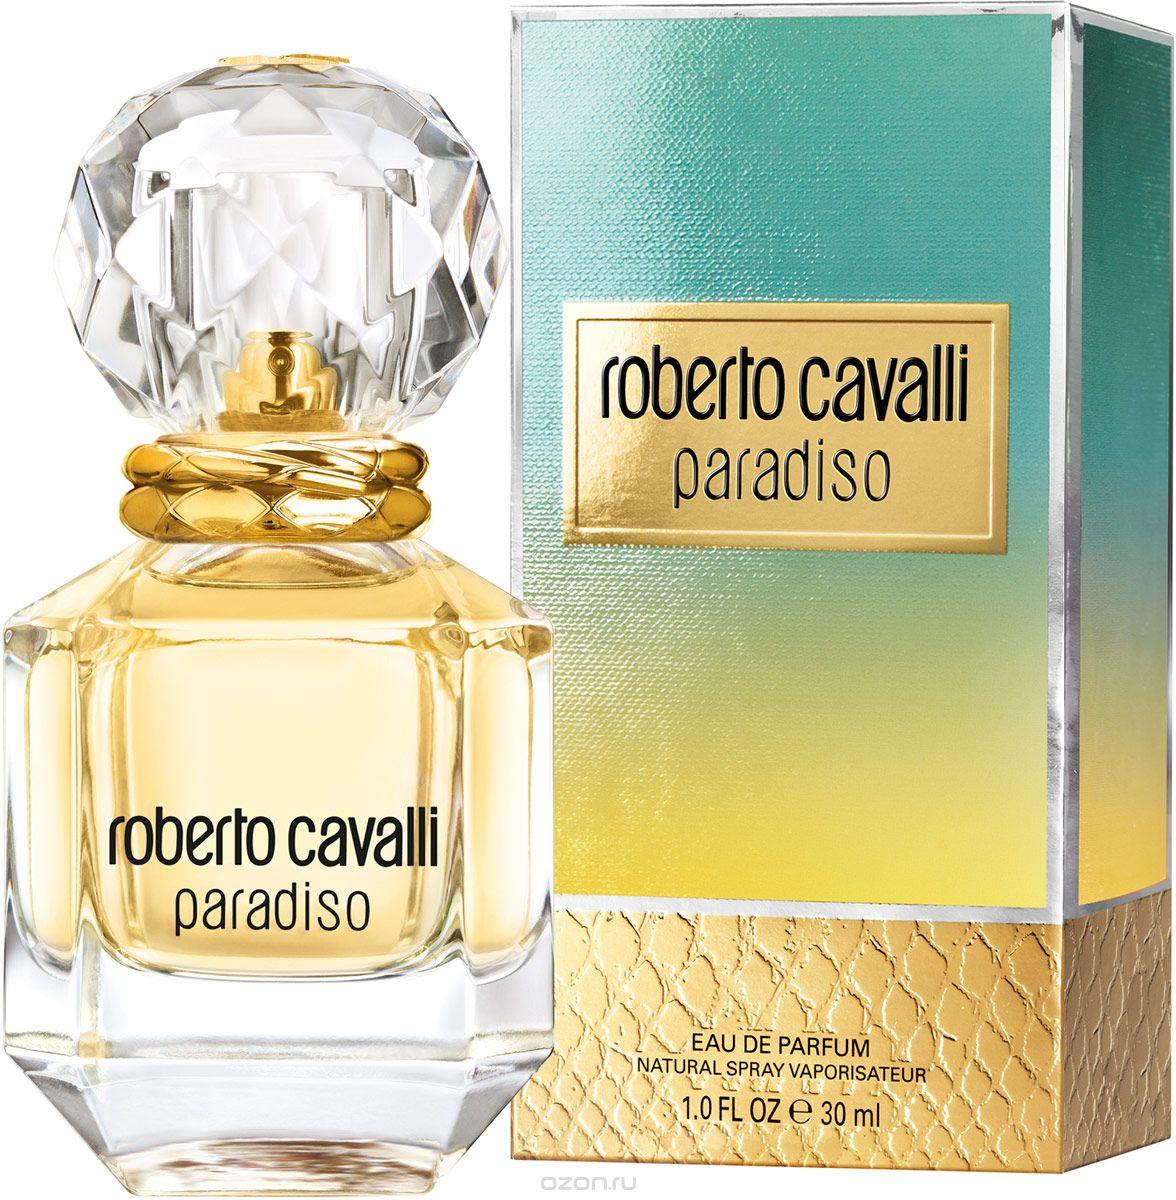 Roberto Cavalli - Paradiso - eau de parfum